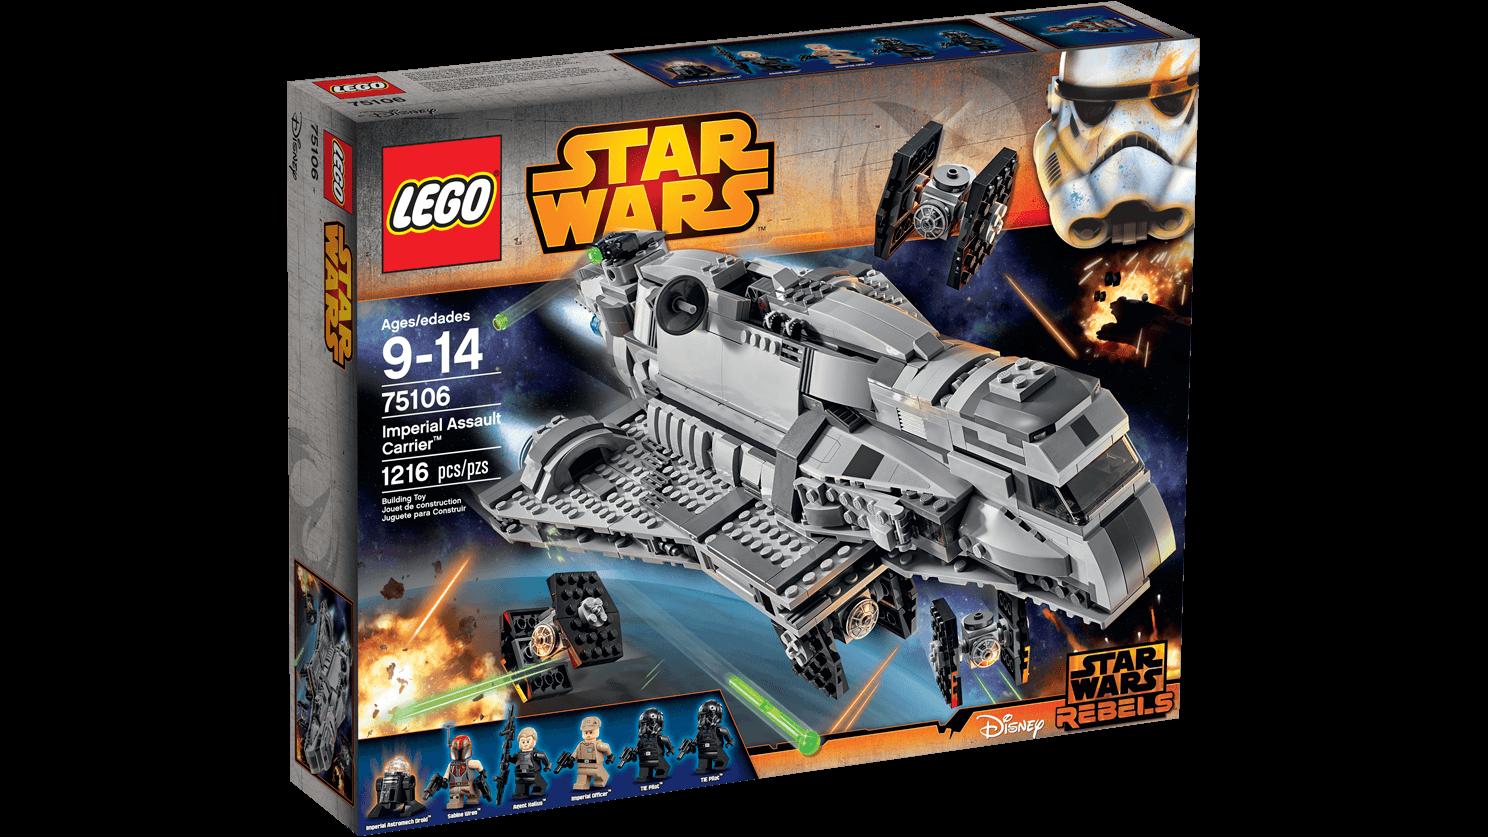 Imperial Assault Carrier 75106